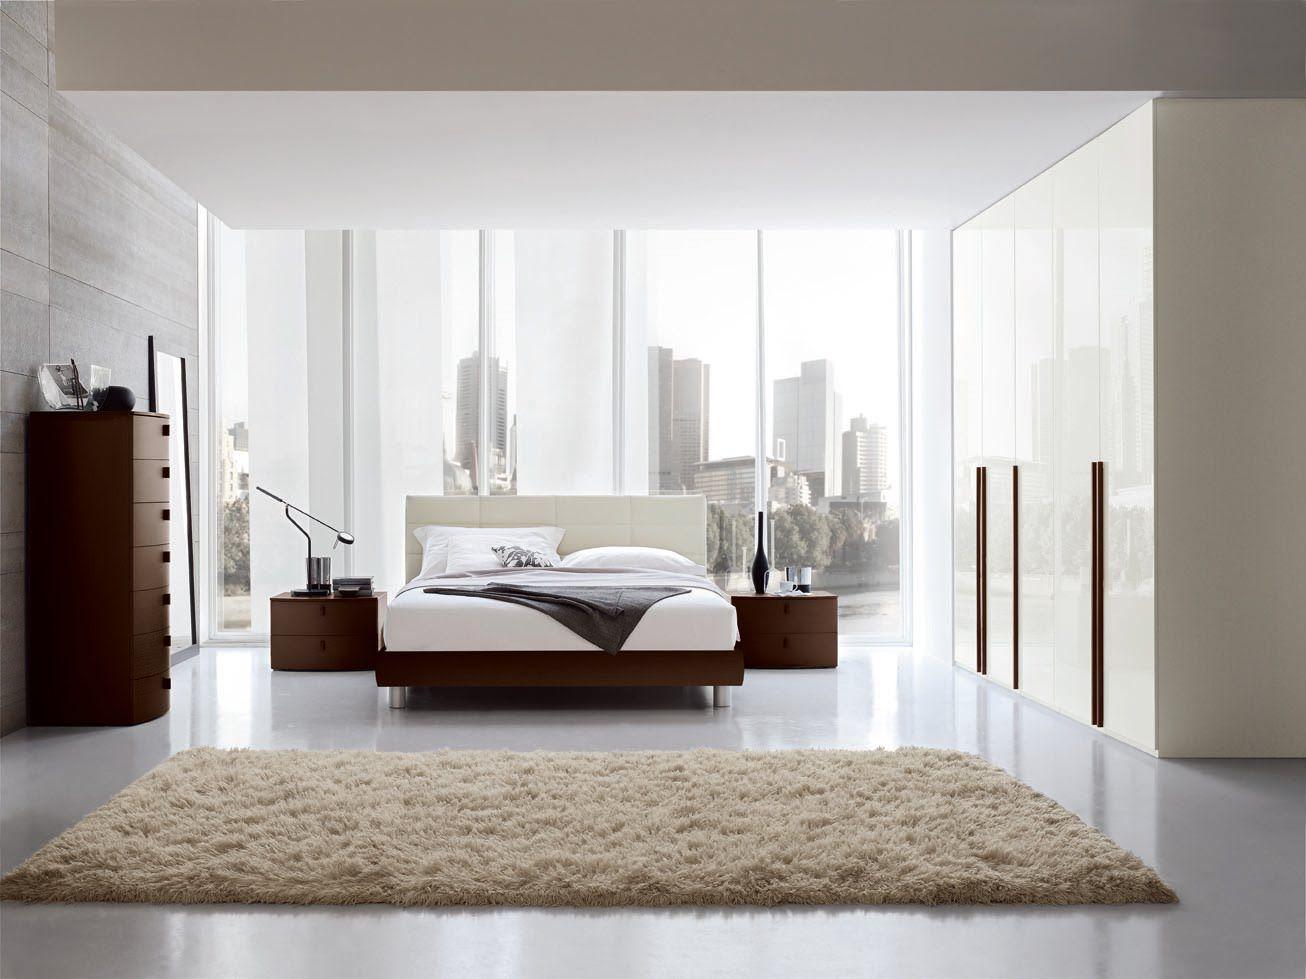 Modern bedroom design with a white granite floor #granite #floor